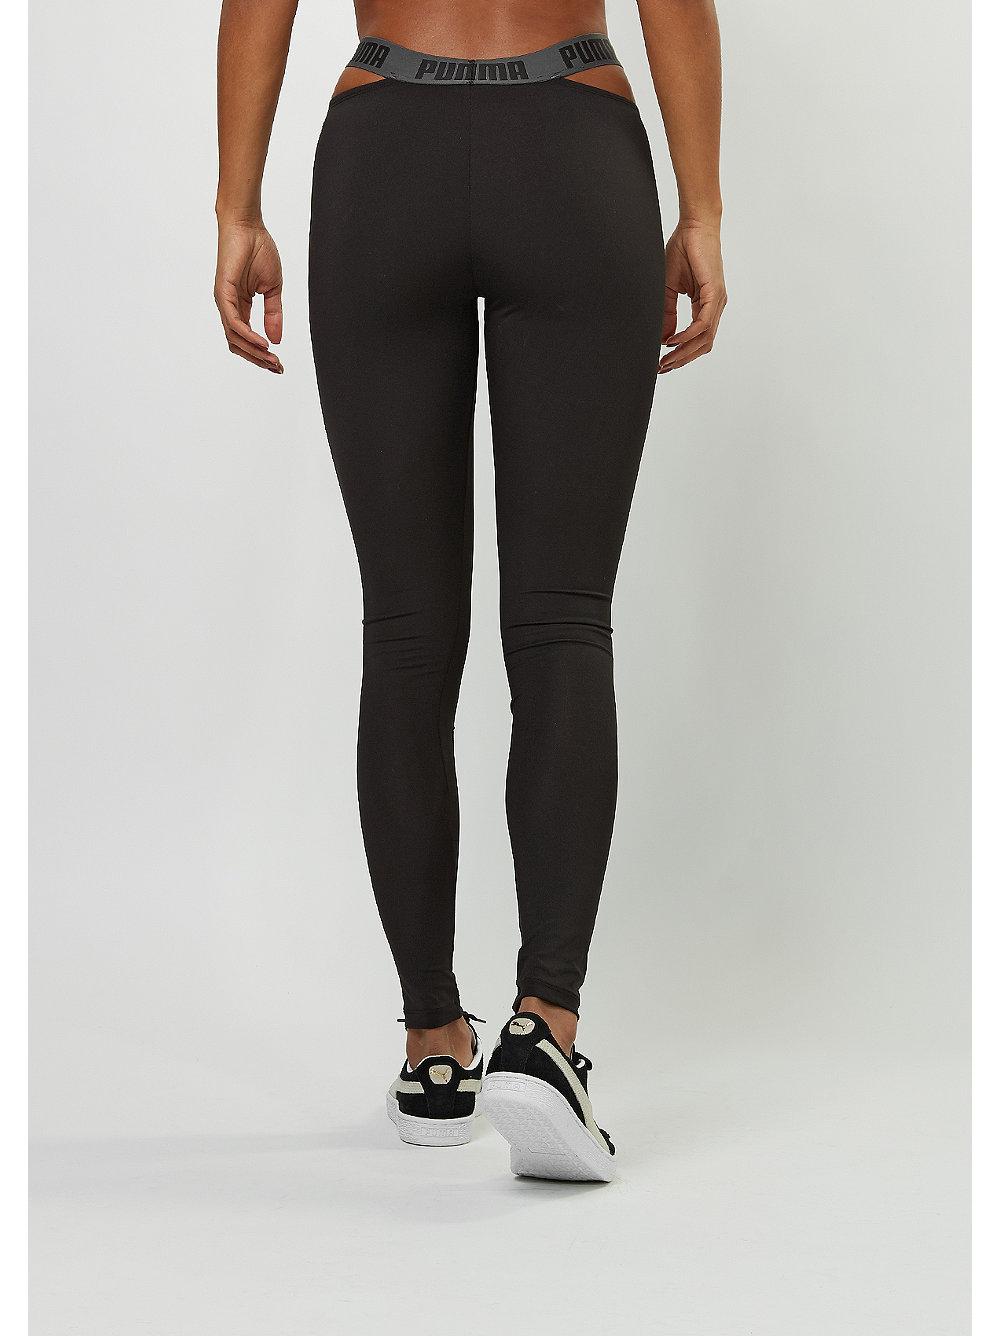 puma leggings cut out